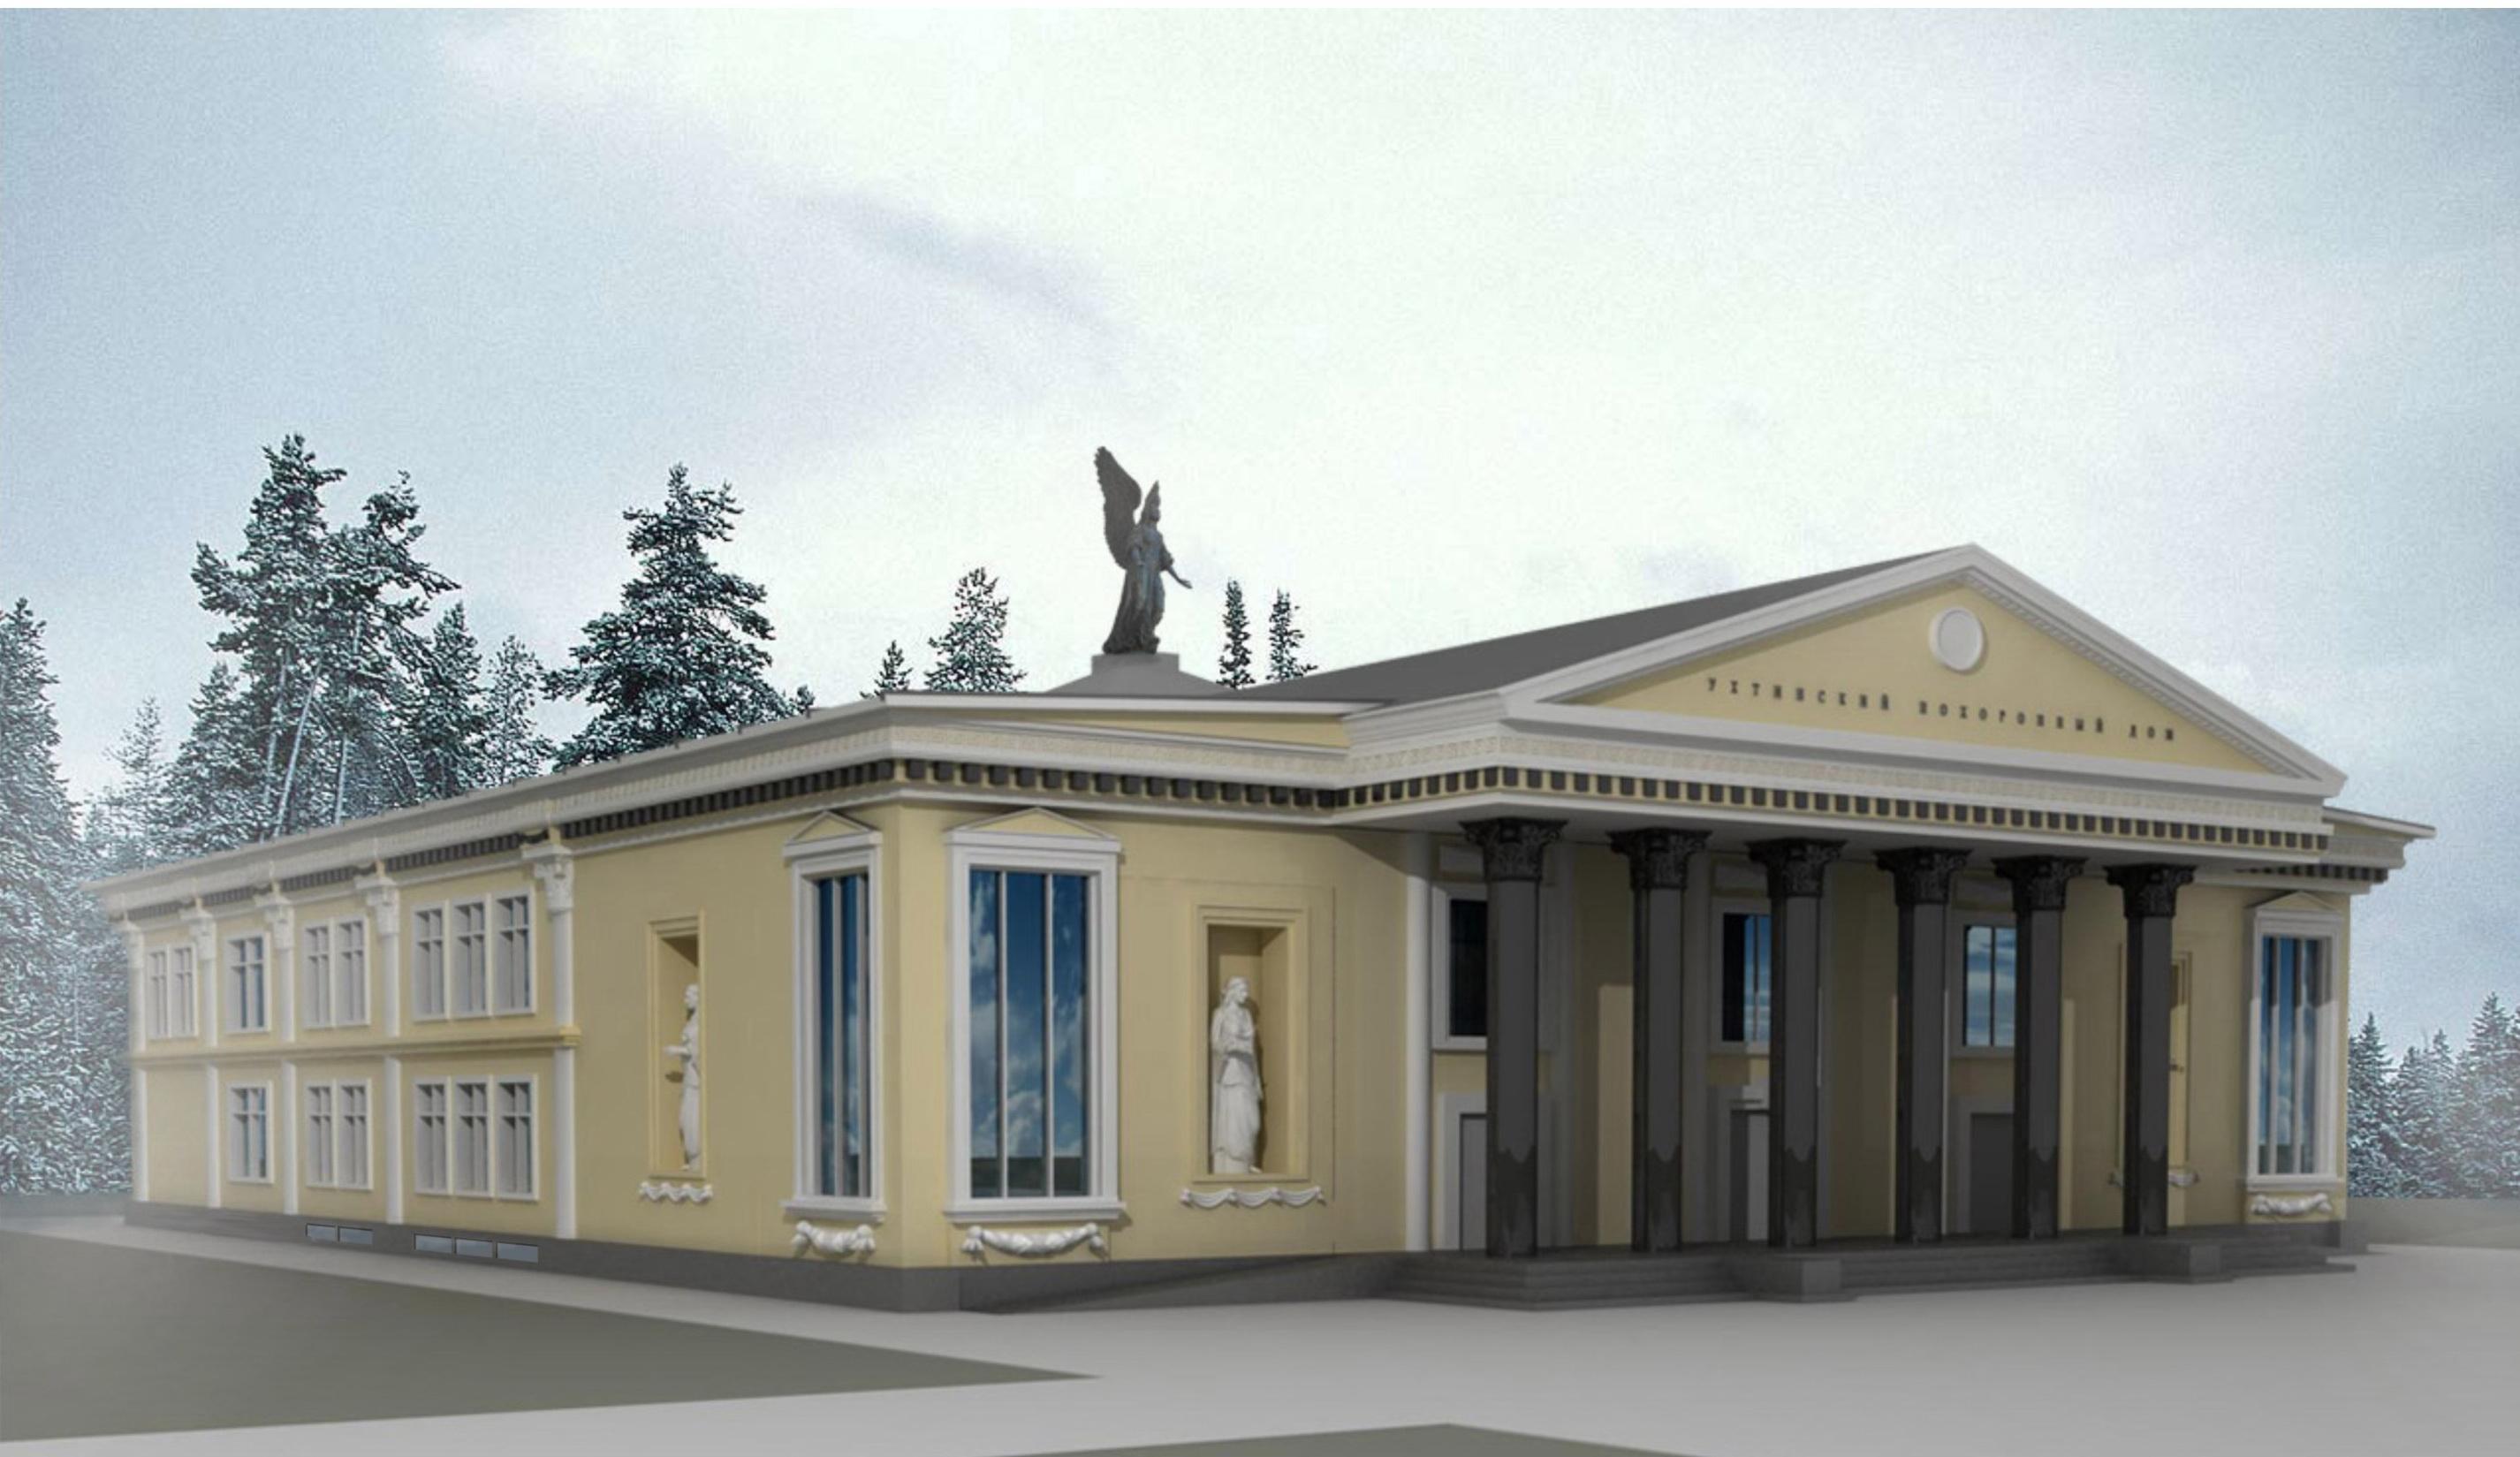 Ухта_Похоронный дом_фасад-на выставку